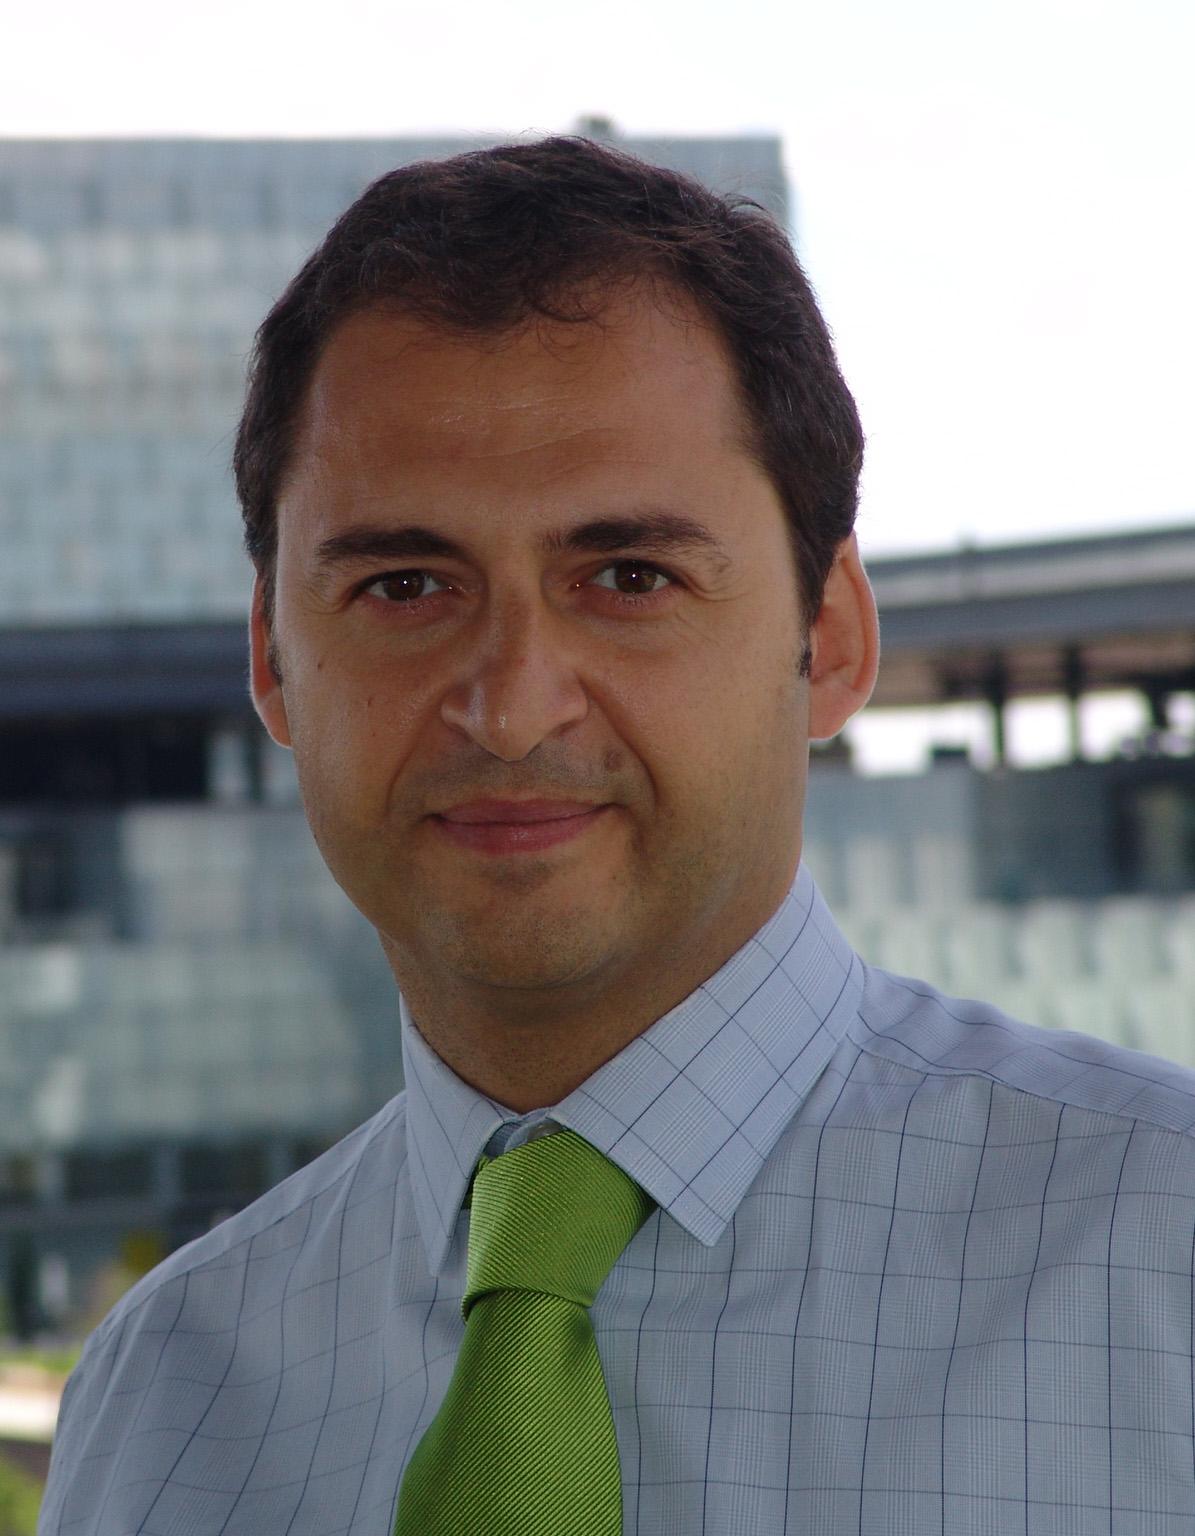 Jorge Dumont Sañudo